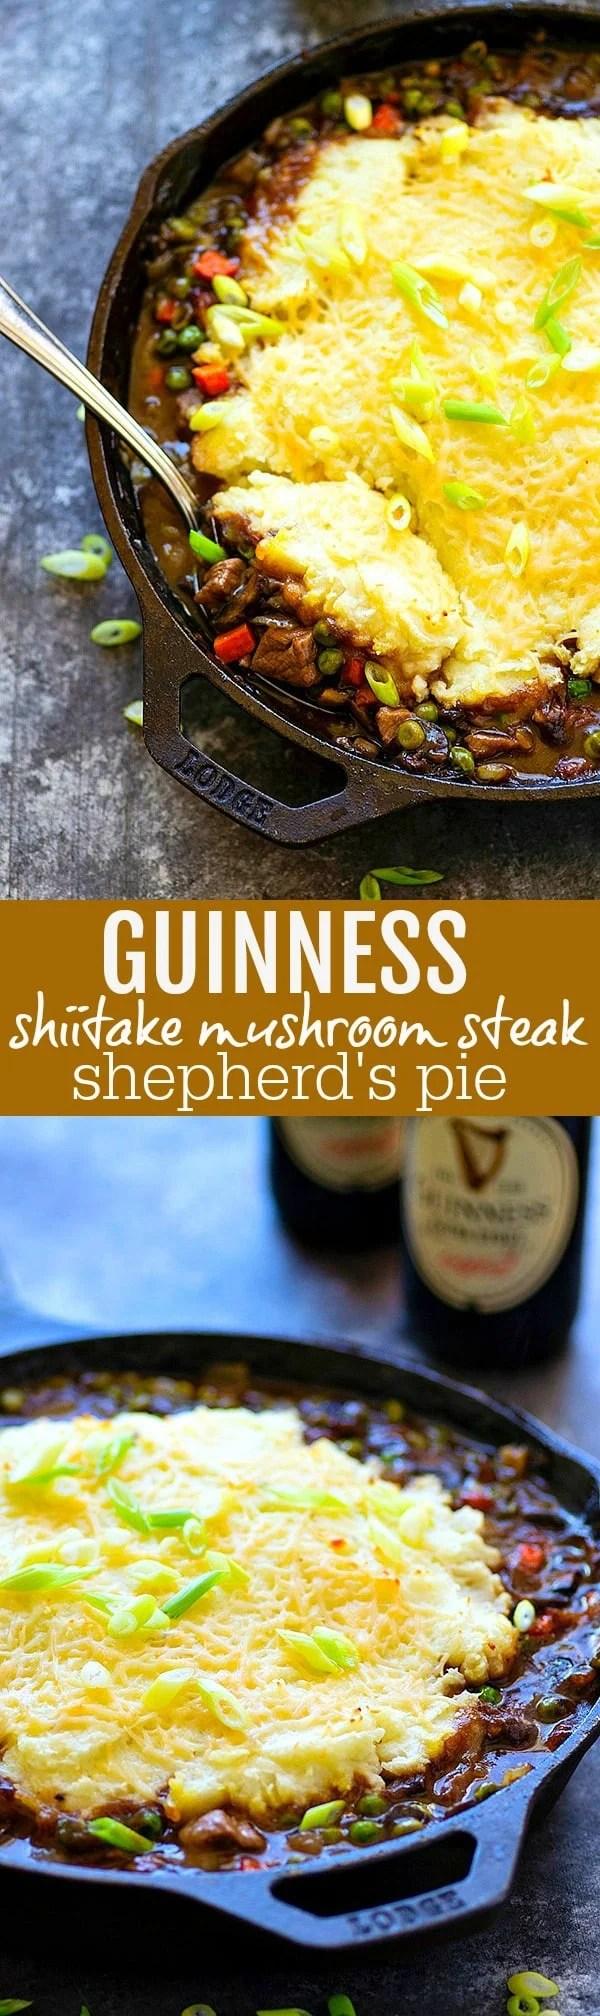 Guinness Shiitake Mushroom Steak Shepherd's Pie - Dark guinness beer, tender shiitake mushrooms, and juicy steak transform a classic comfort food into a SUPER cozy dinner that will find a permanent spot on the dinner menu!